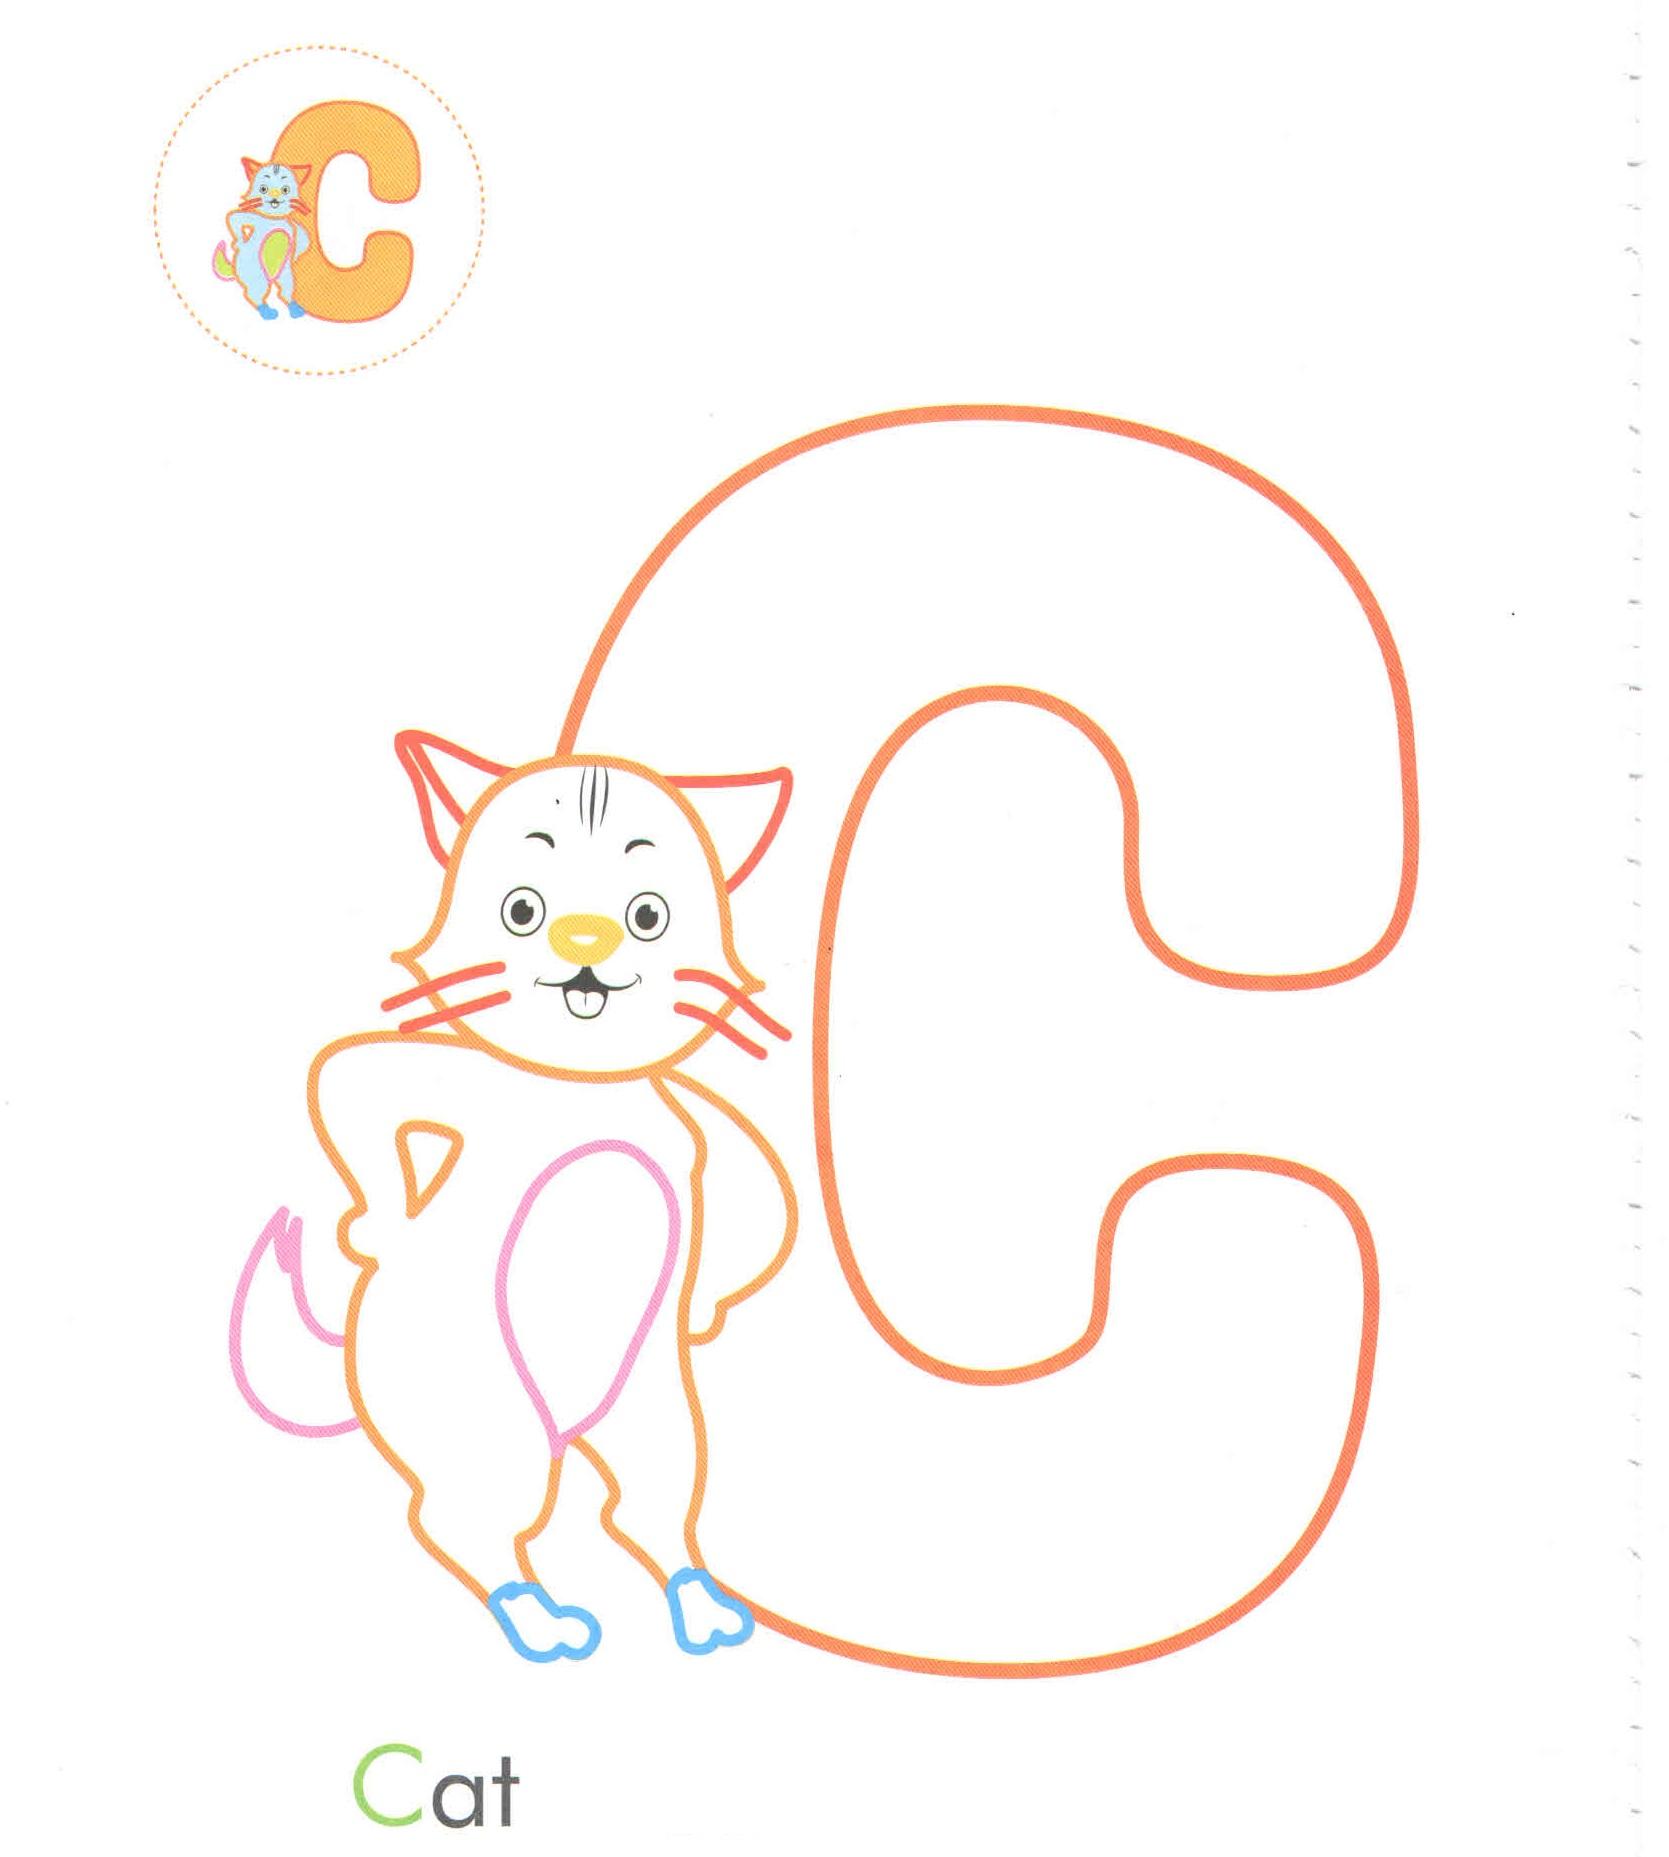 Alphabet Letter C Cat Coloring Page For Preschool